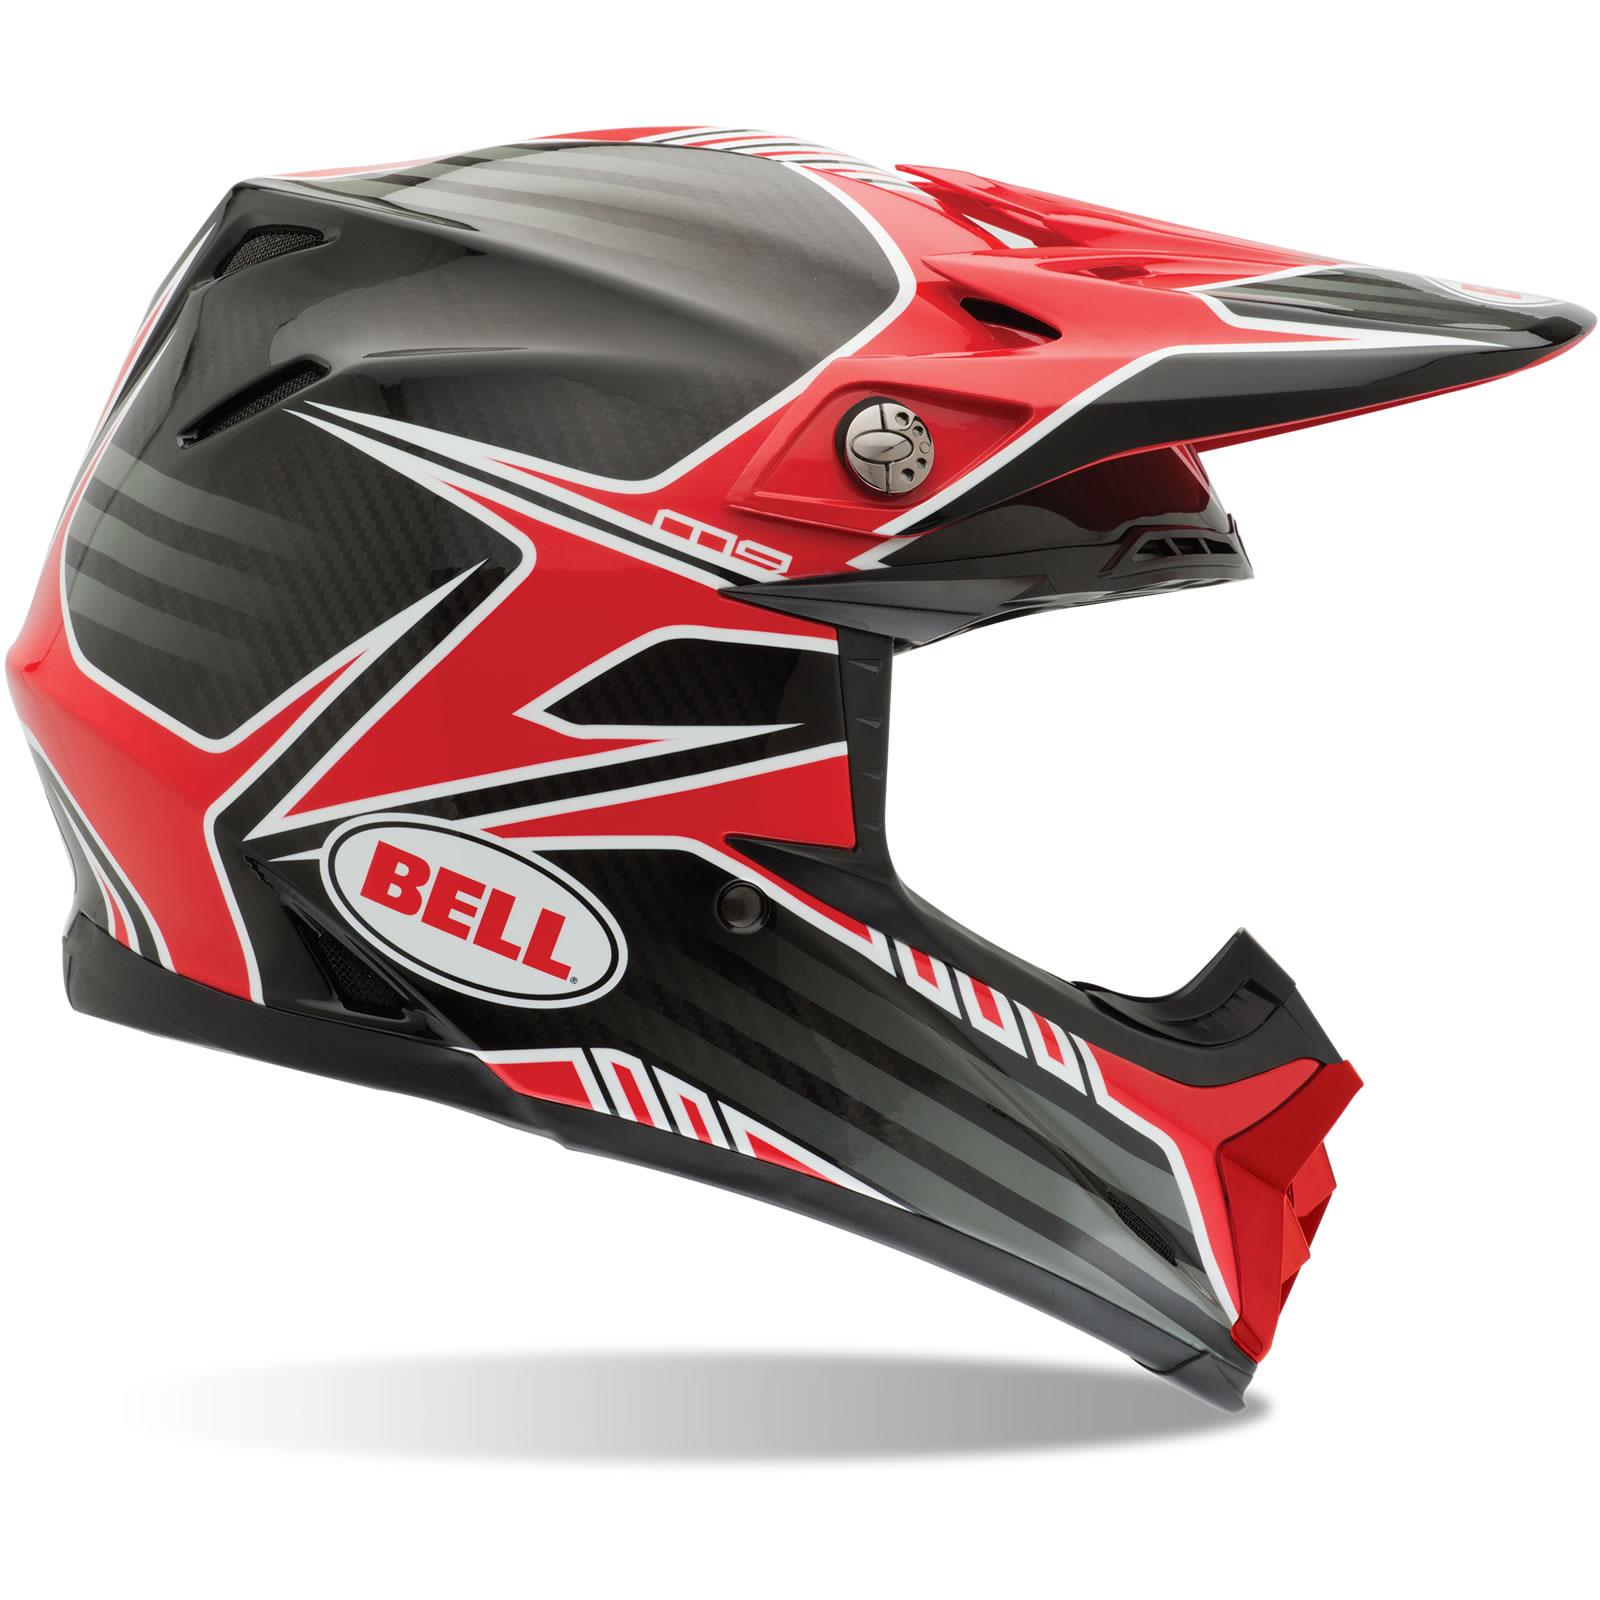 bell moto 9 carbon fibre pinned red black white motocross helmet off road mx lid ebay. Black Bedroom Furniture Sets. Home Design Ideas